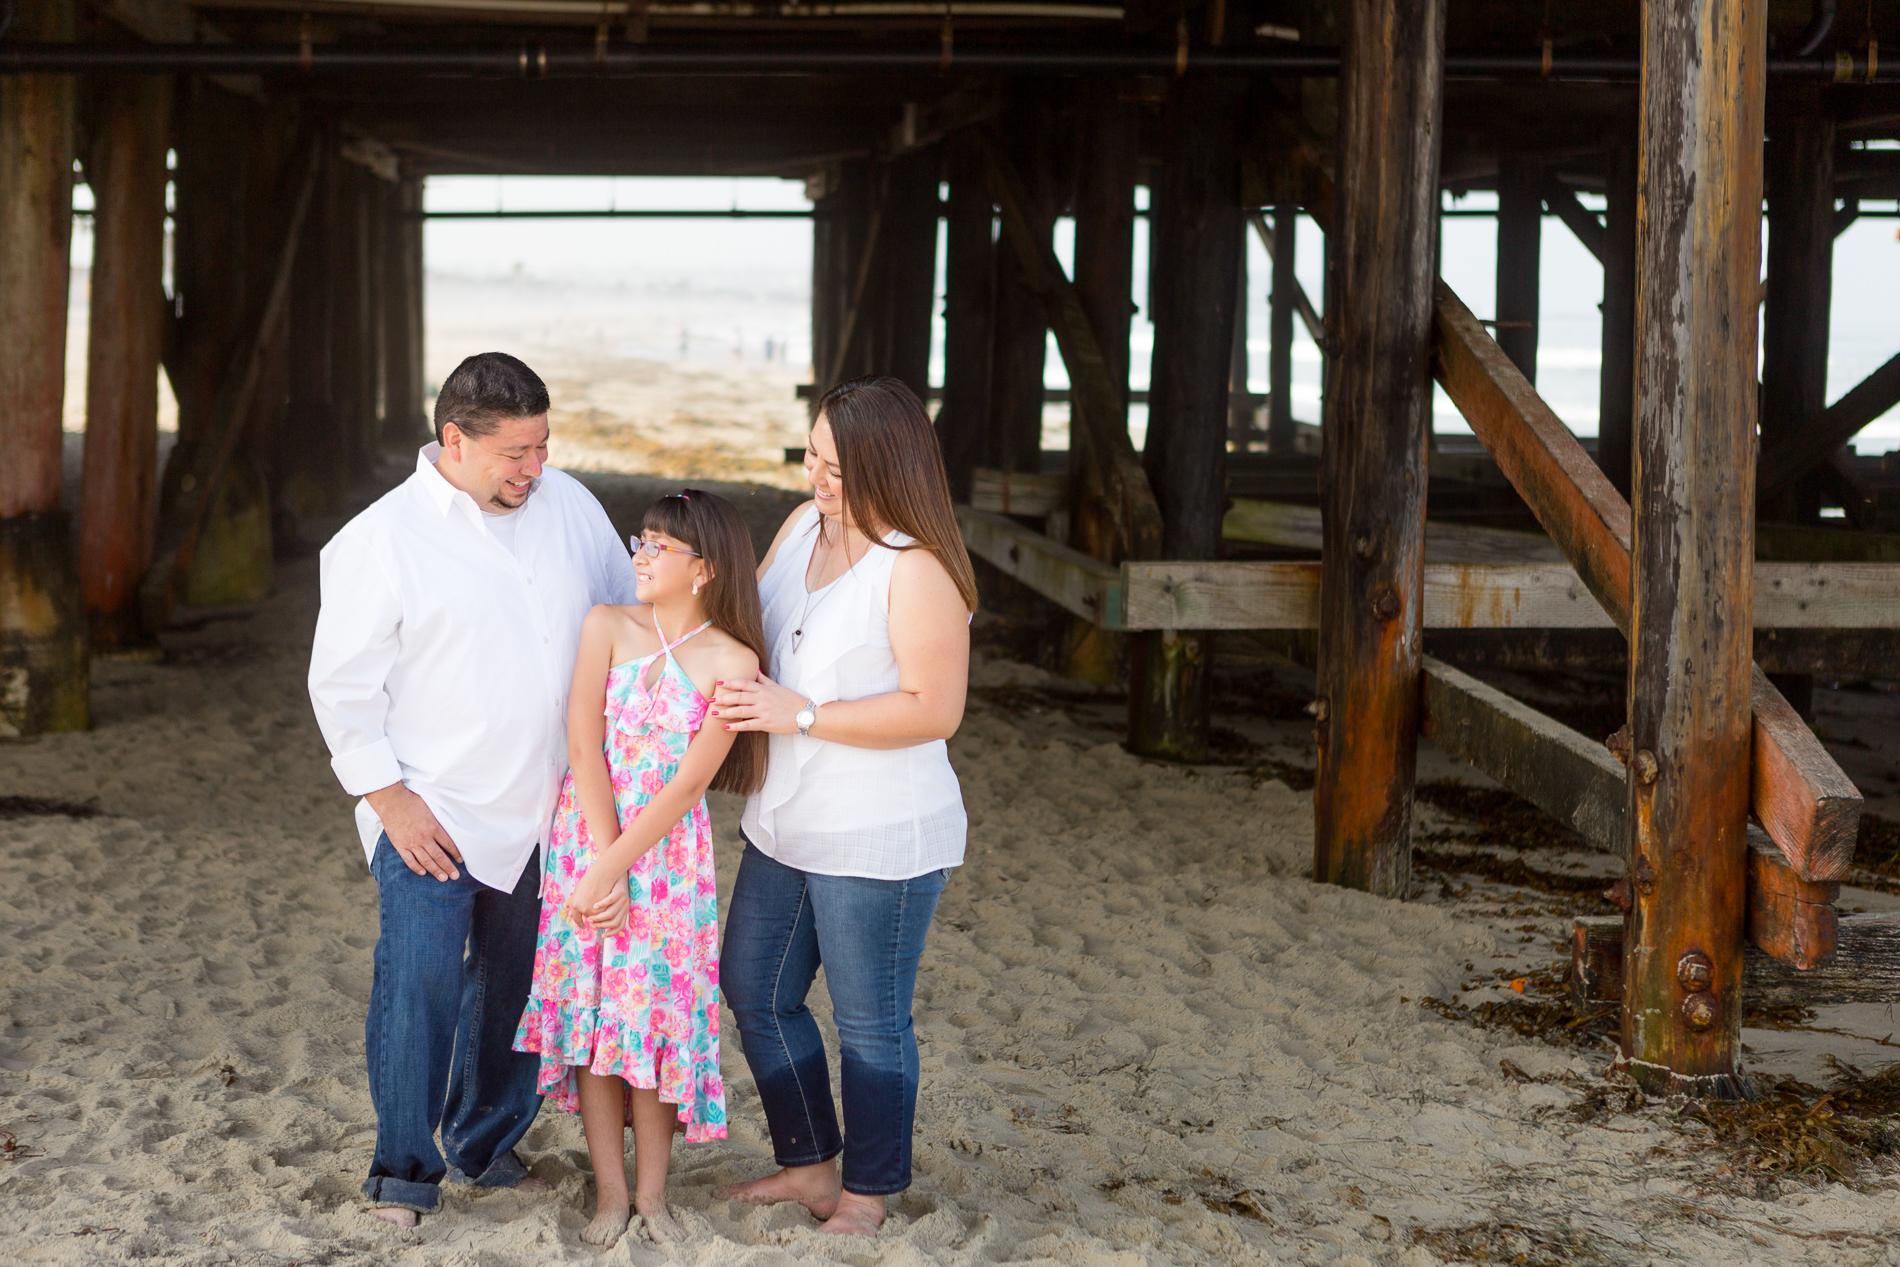 San.Diego.Family.Vacation.Photographer.Christine.Dammann.Photography.GFWS-1.jpg